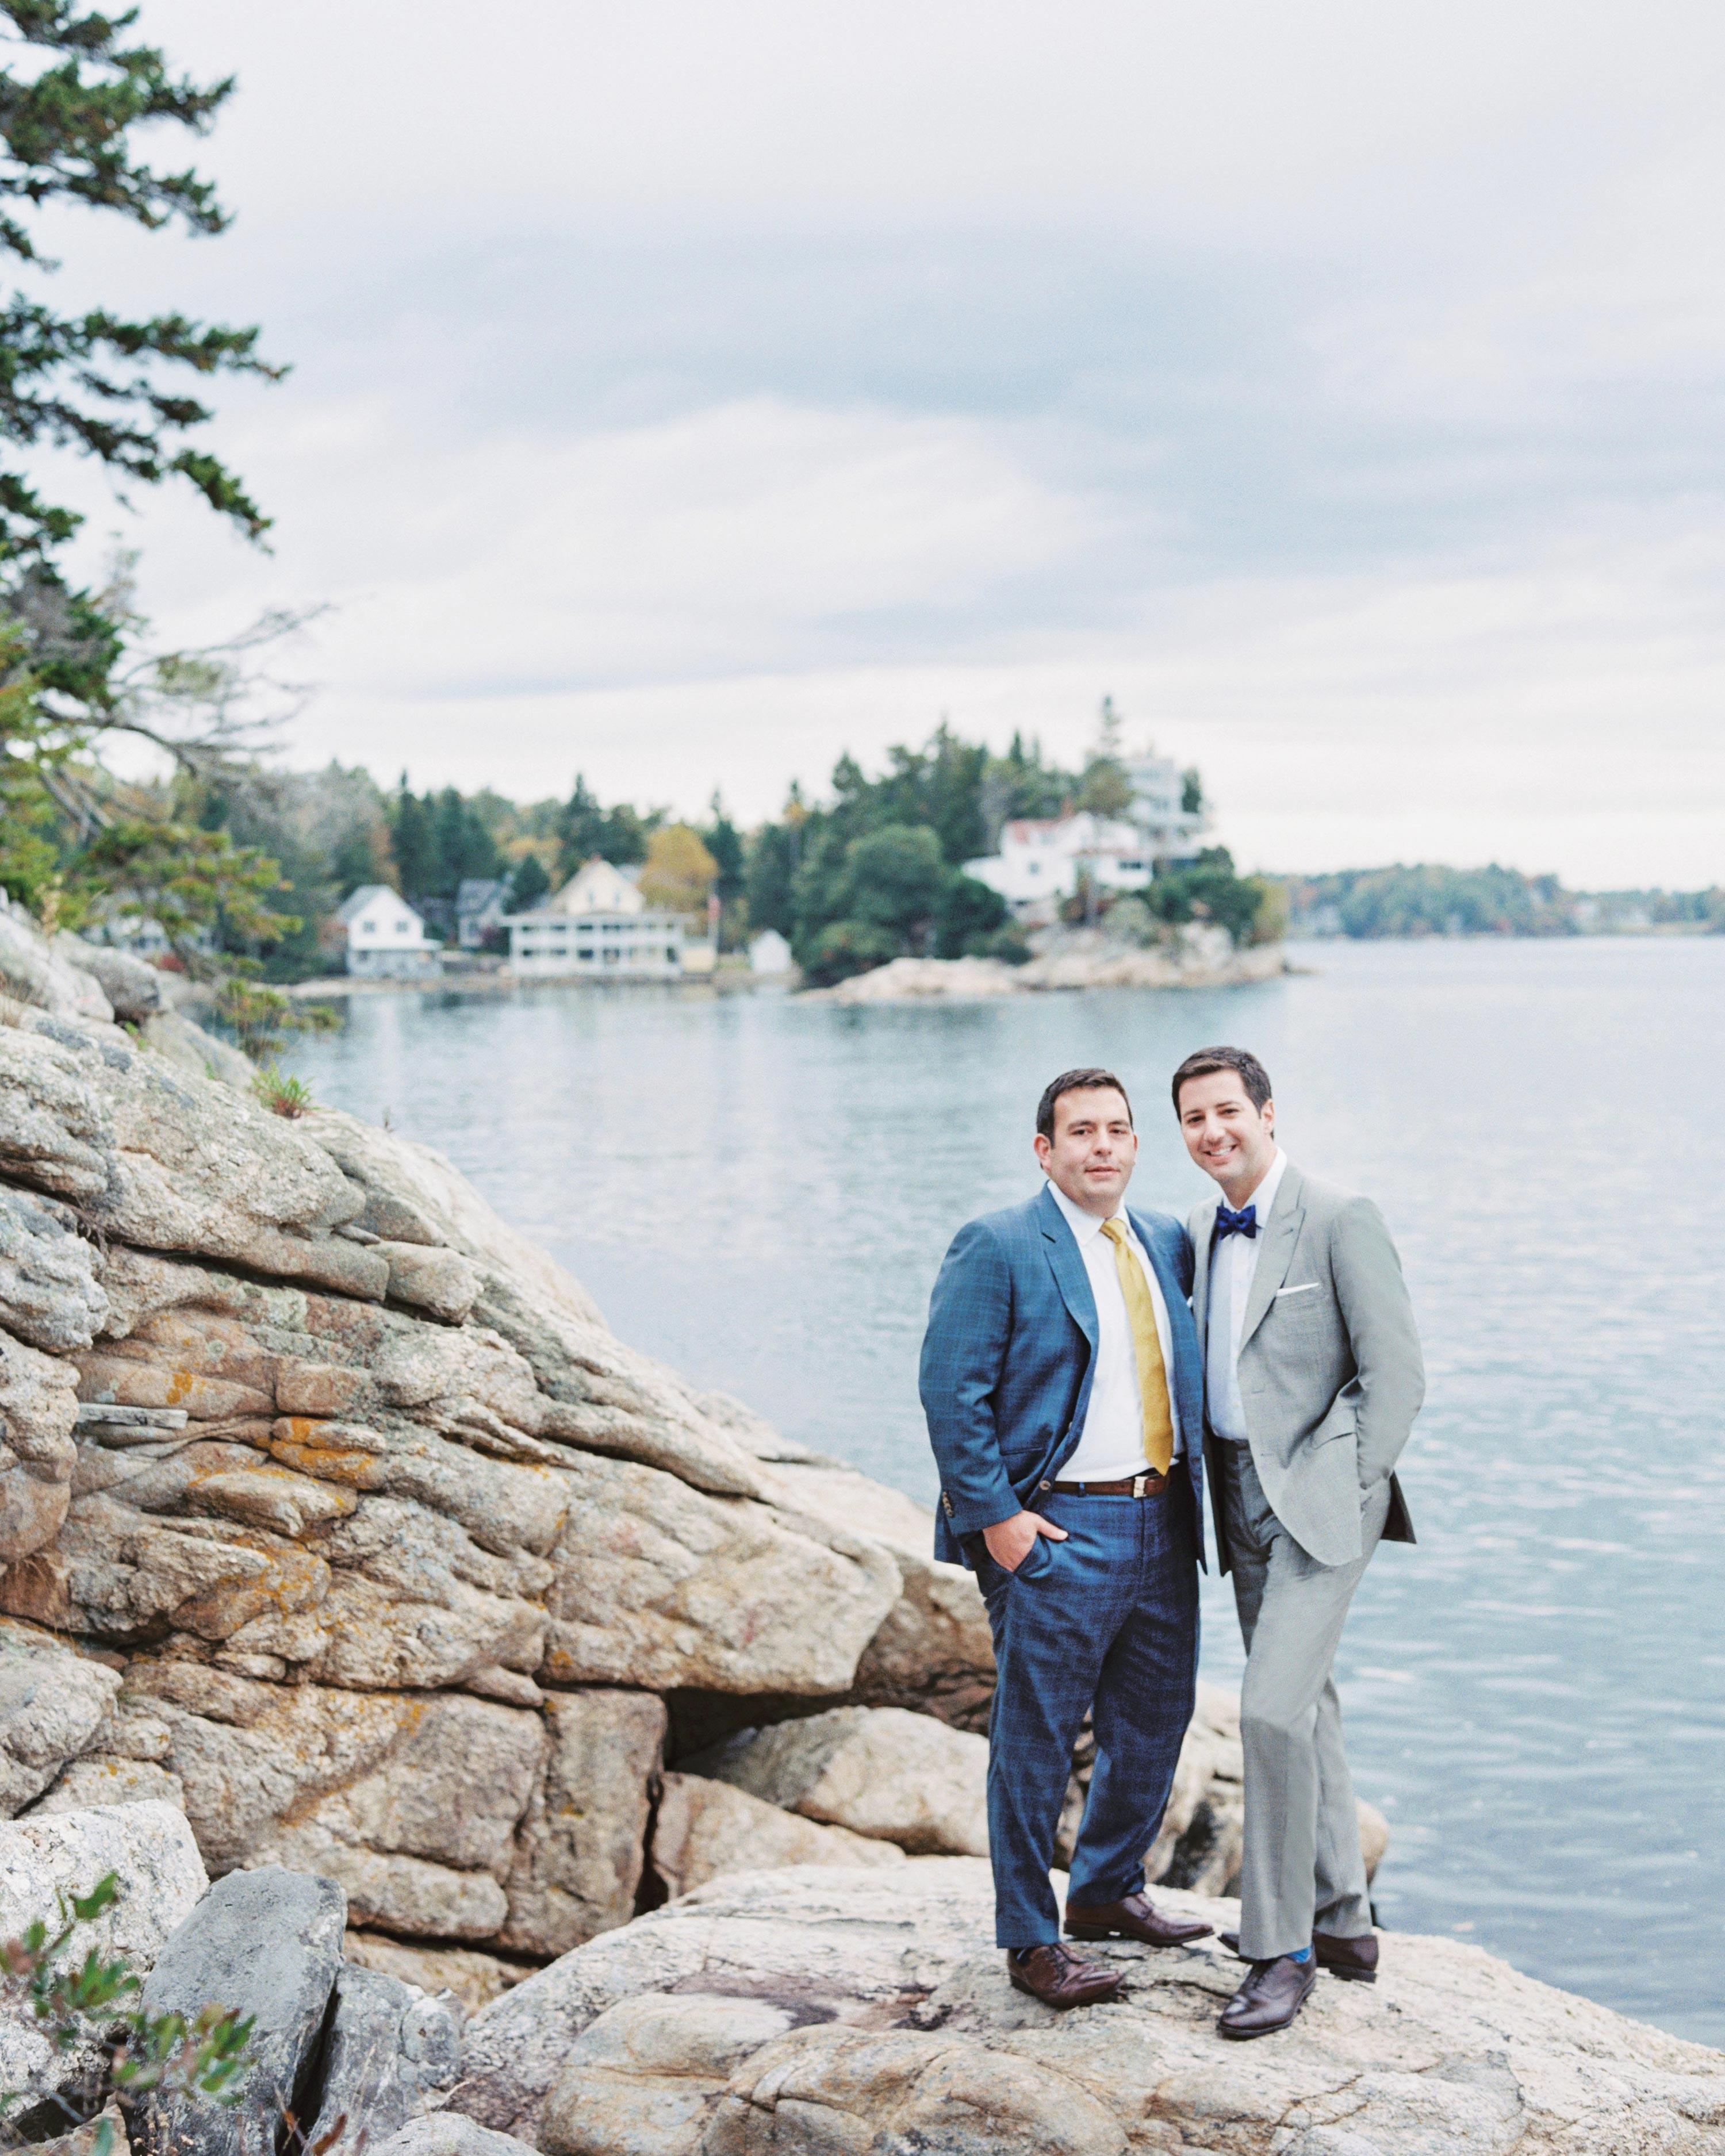 josh-matt-real-wedding-portrait-by-lake-location.jpg